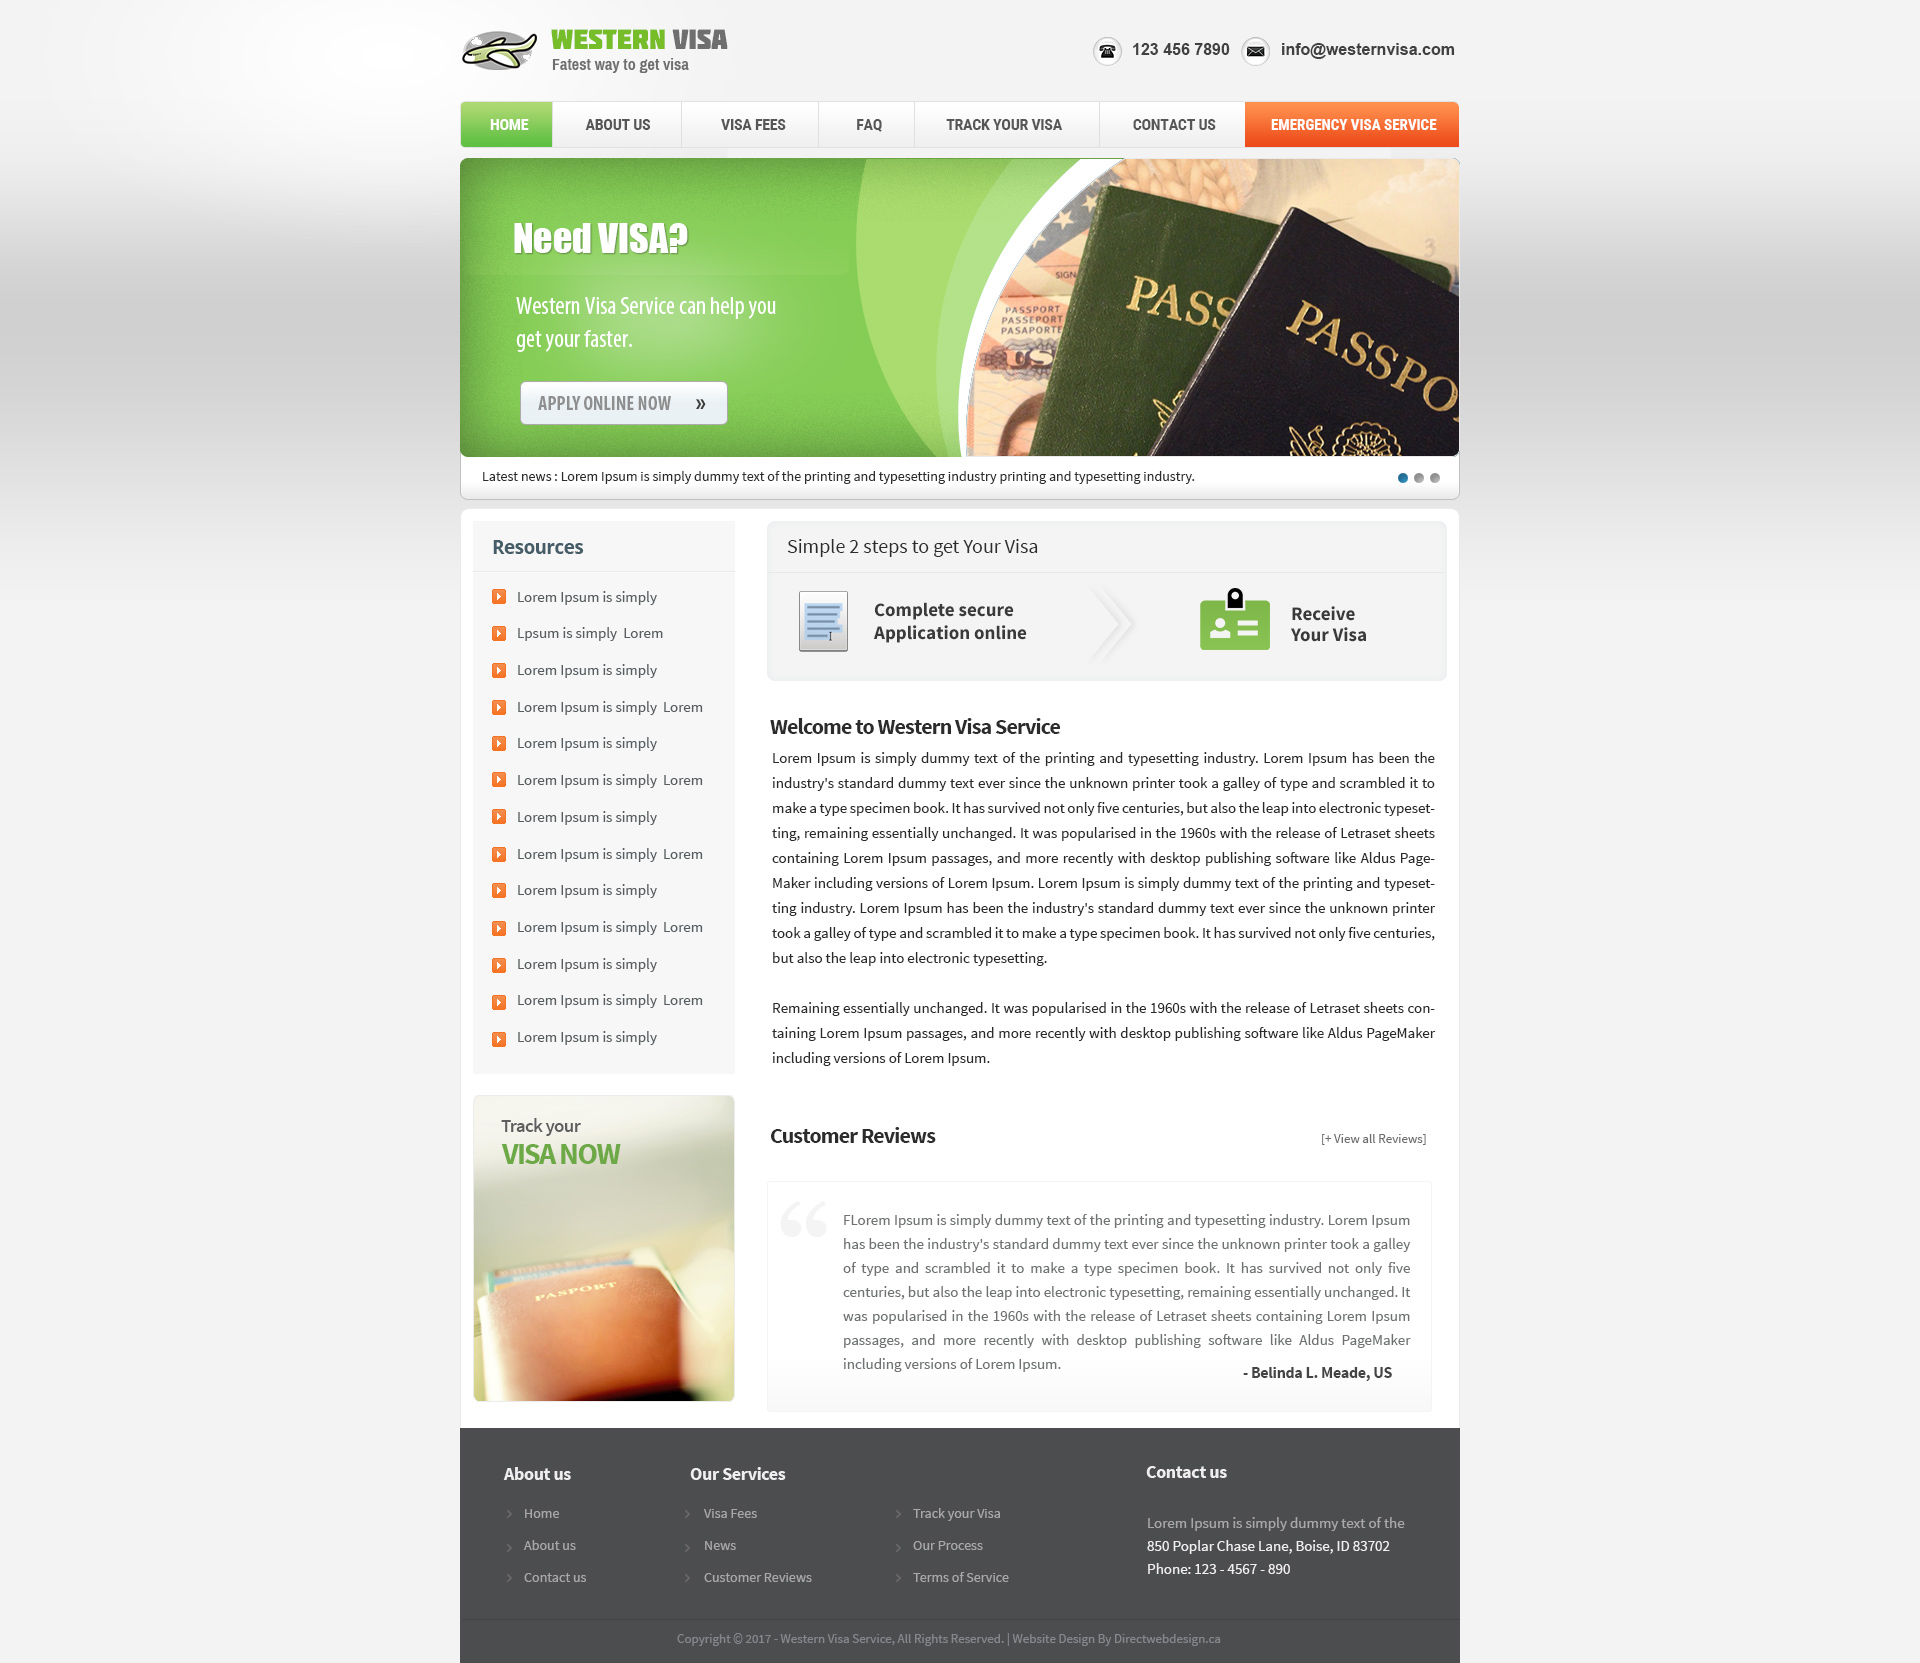 Unique Customizable Website Templates Direct Web Design - About us template for website